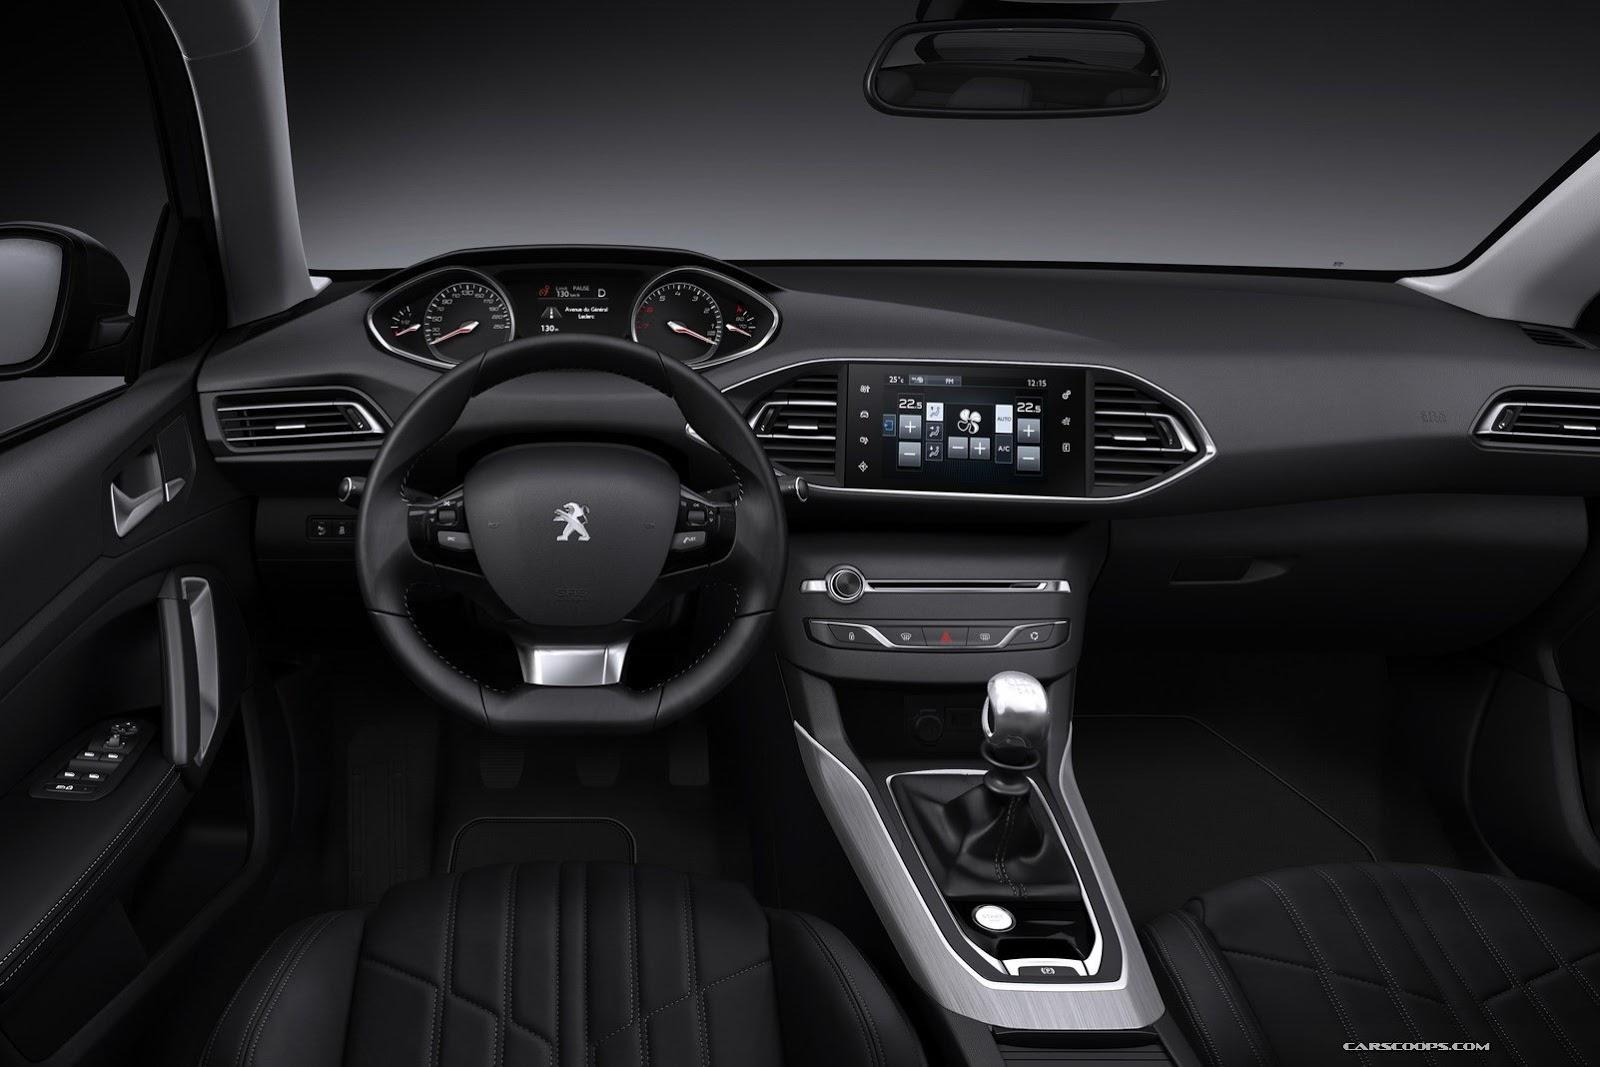 2014-Peugeot-308-Hatch-Carscoops-56%25255B2%25255D.jpg